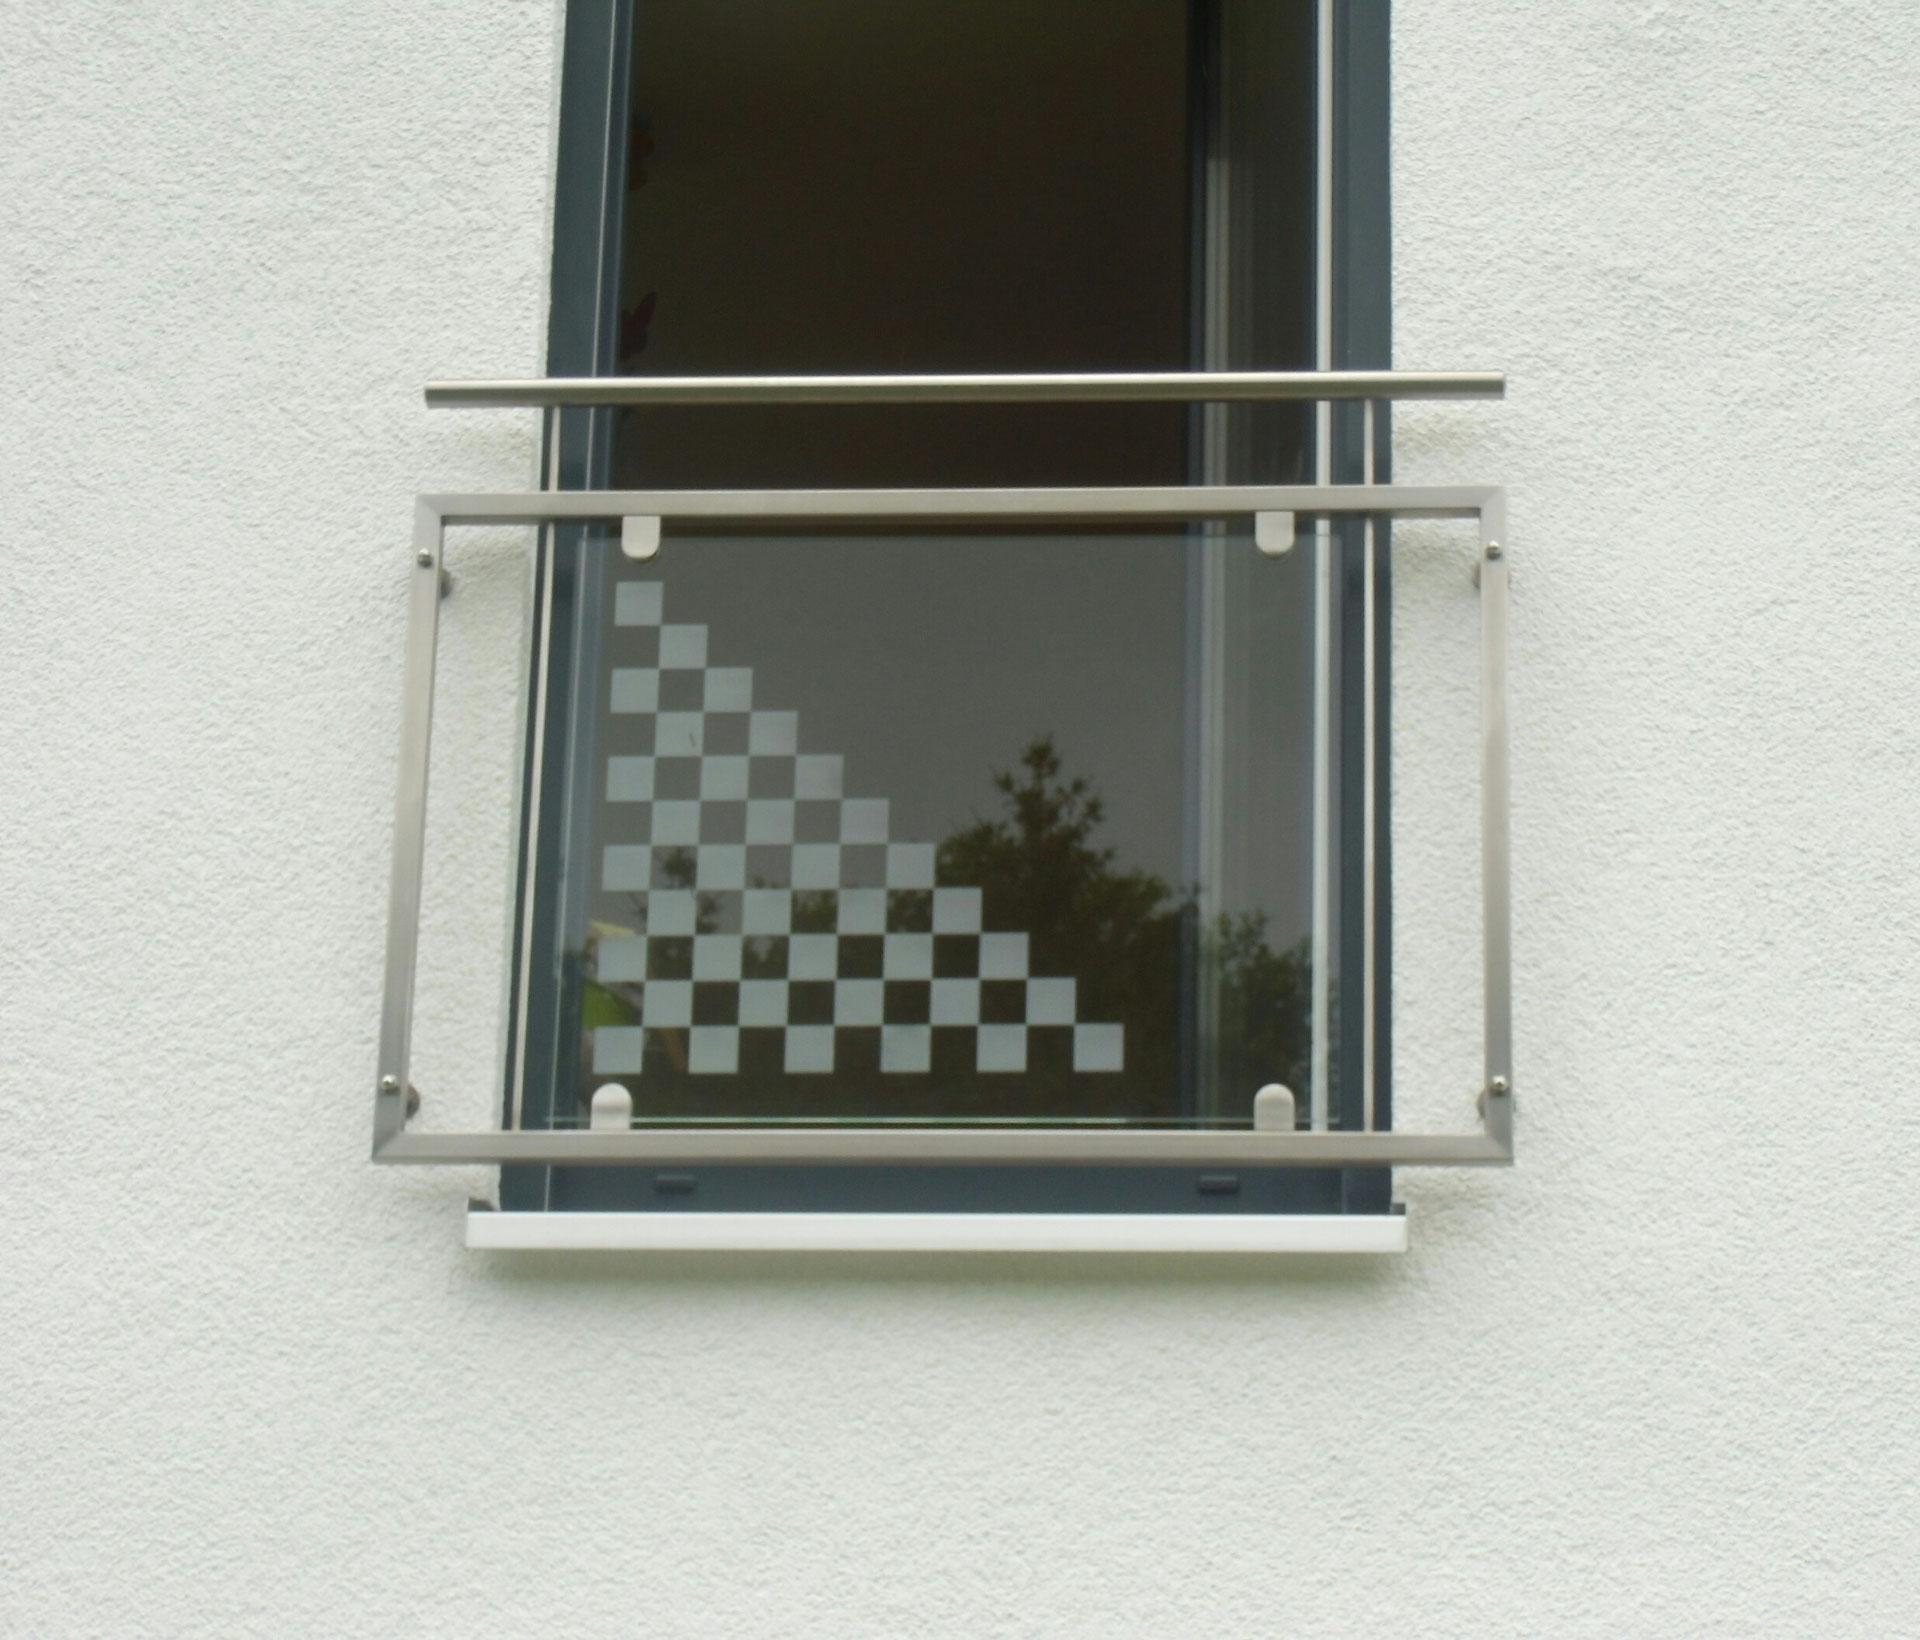 Home Ridder Metallbau Stahlbau Fenstergitter Balkongelander